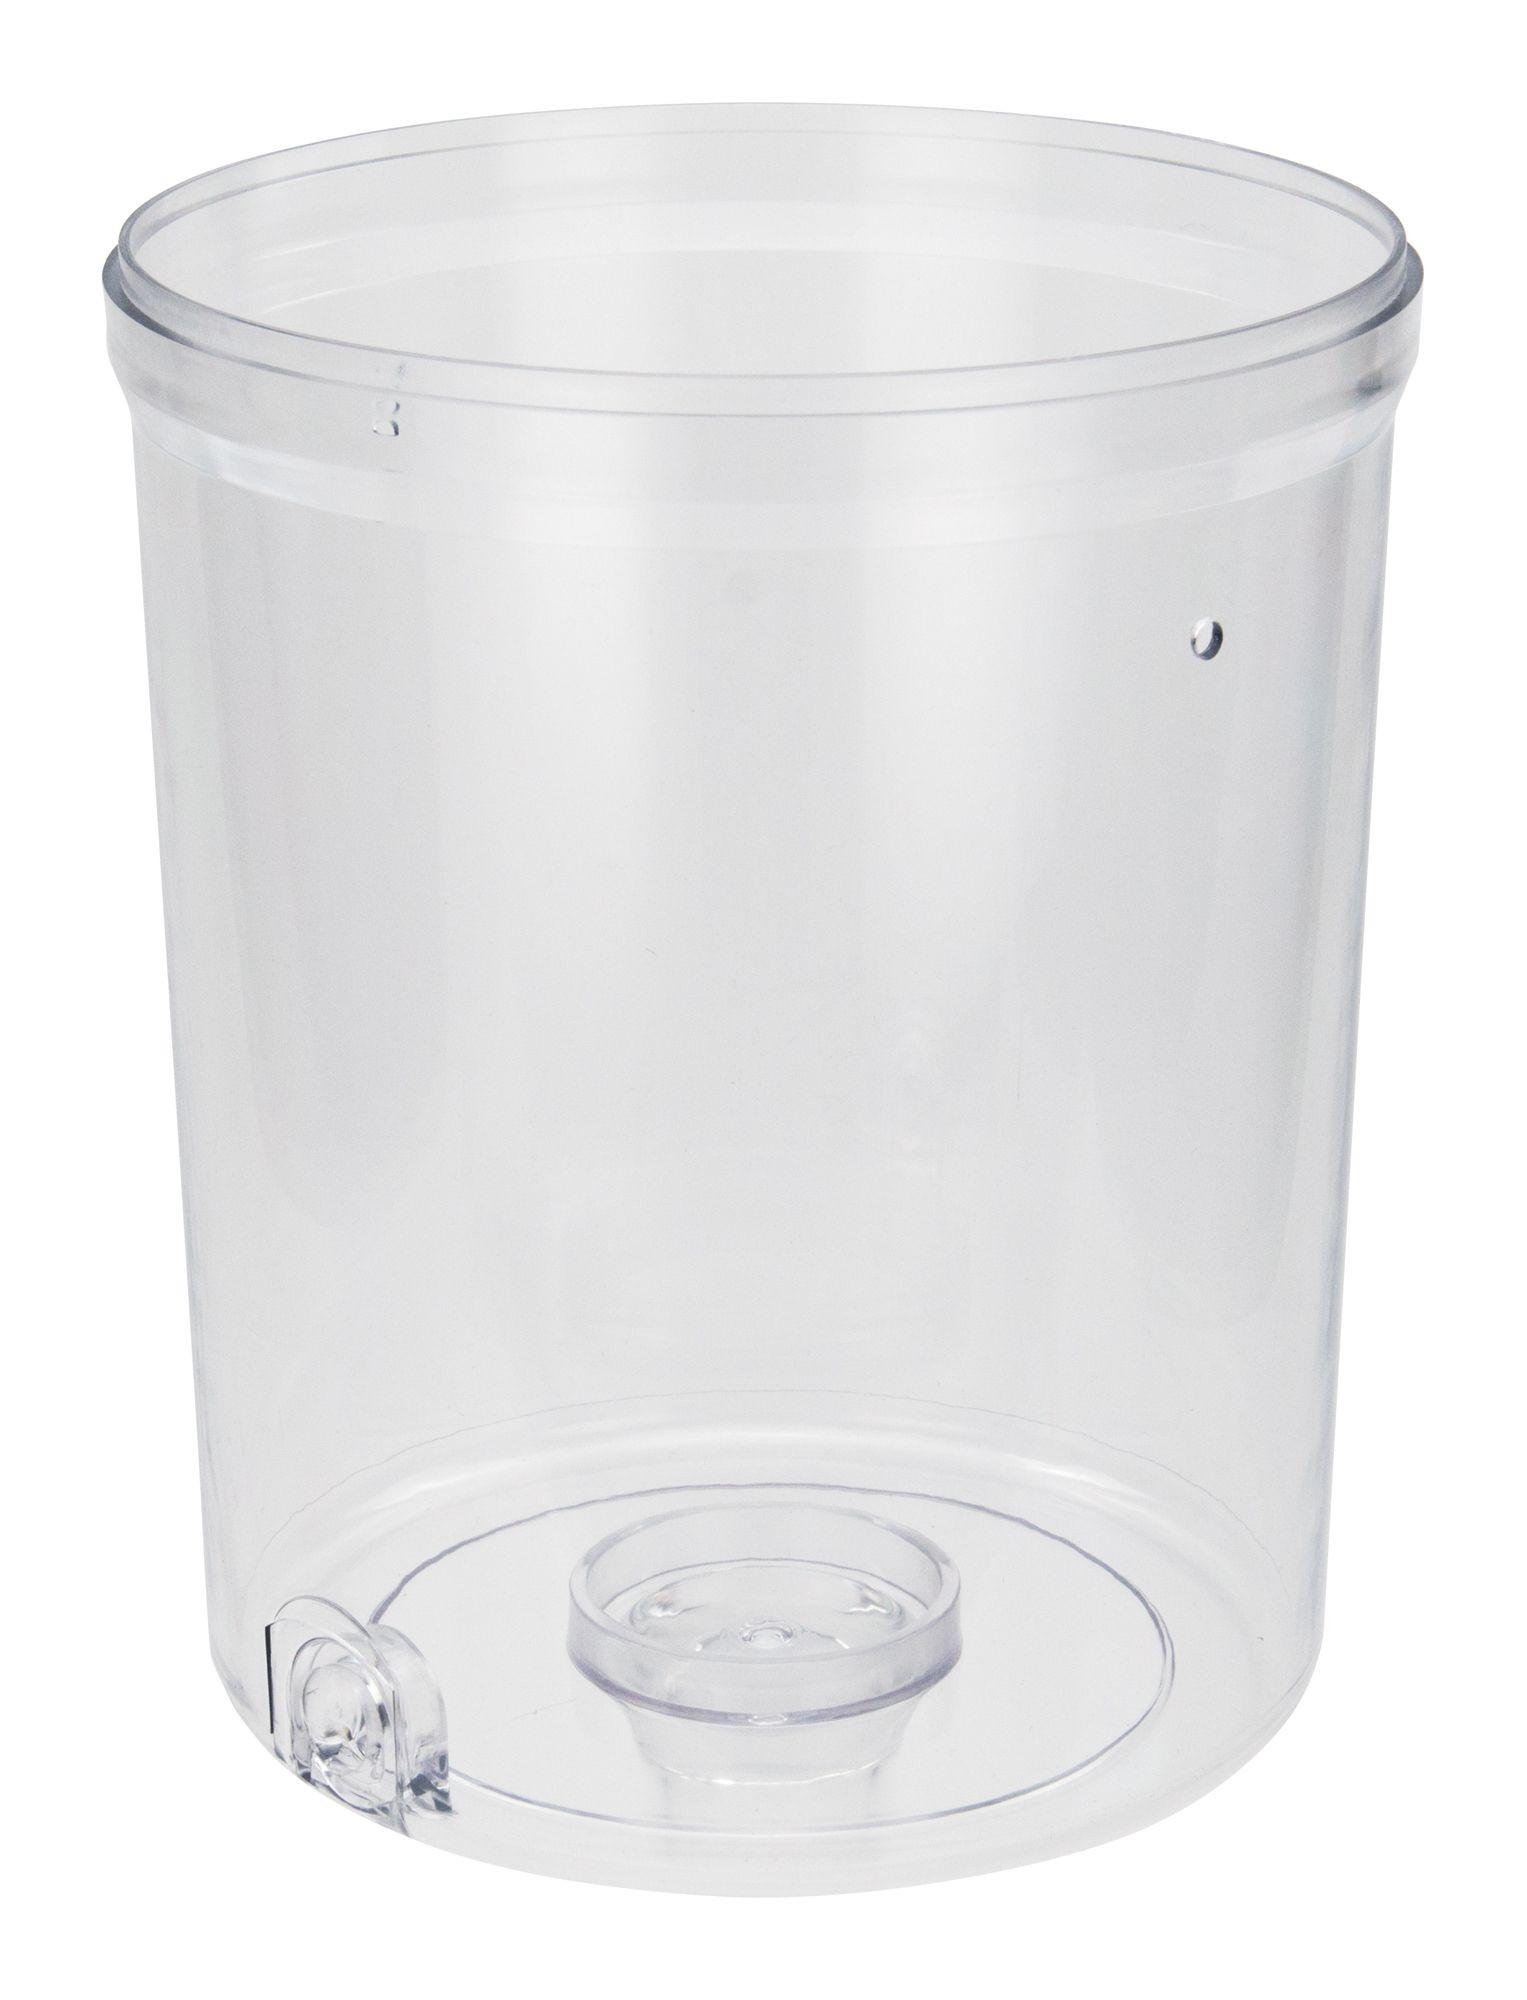 Winco 901-P1 Clear Polycarbonate Beverage Jar for Juice Dispenser 901